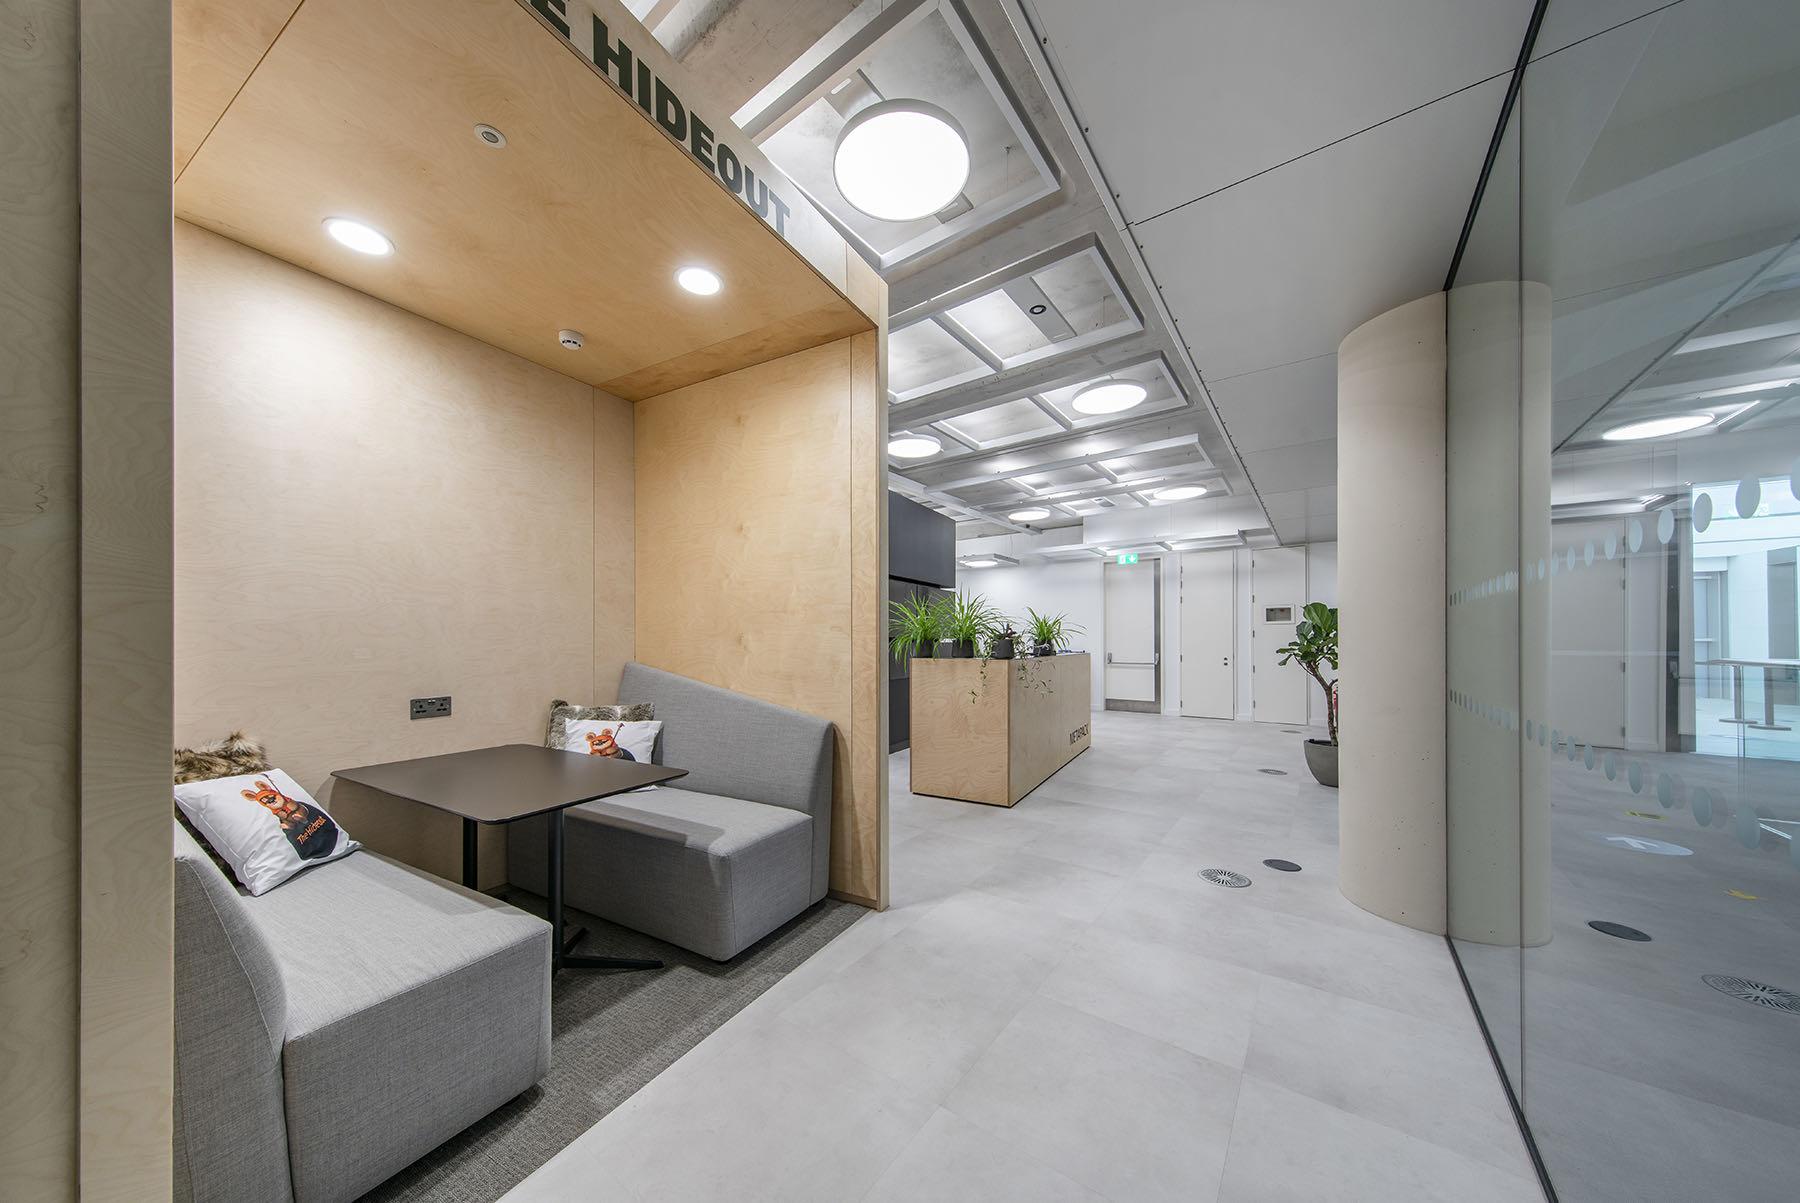 metapack-london-office-3